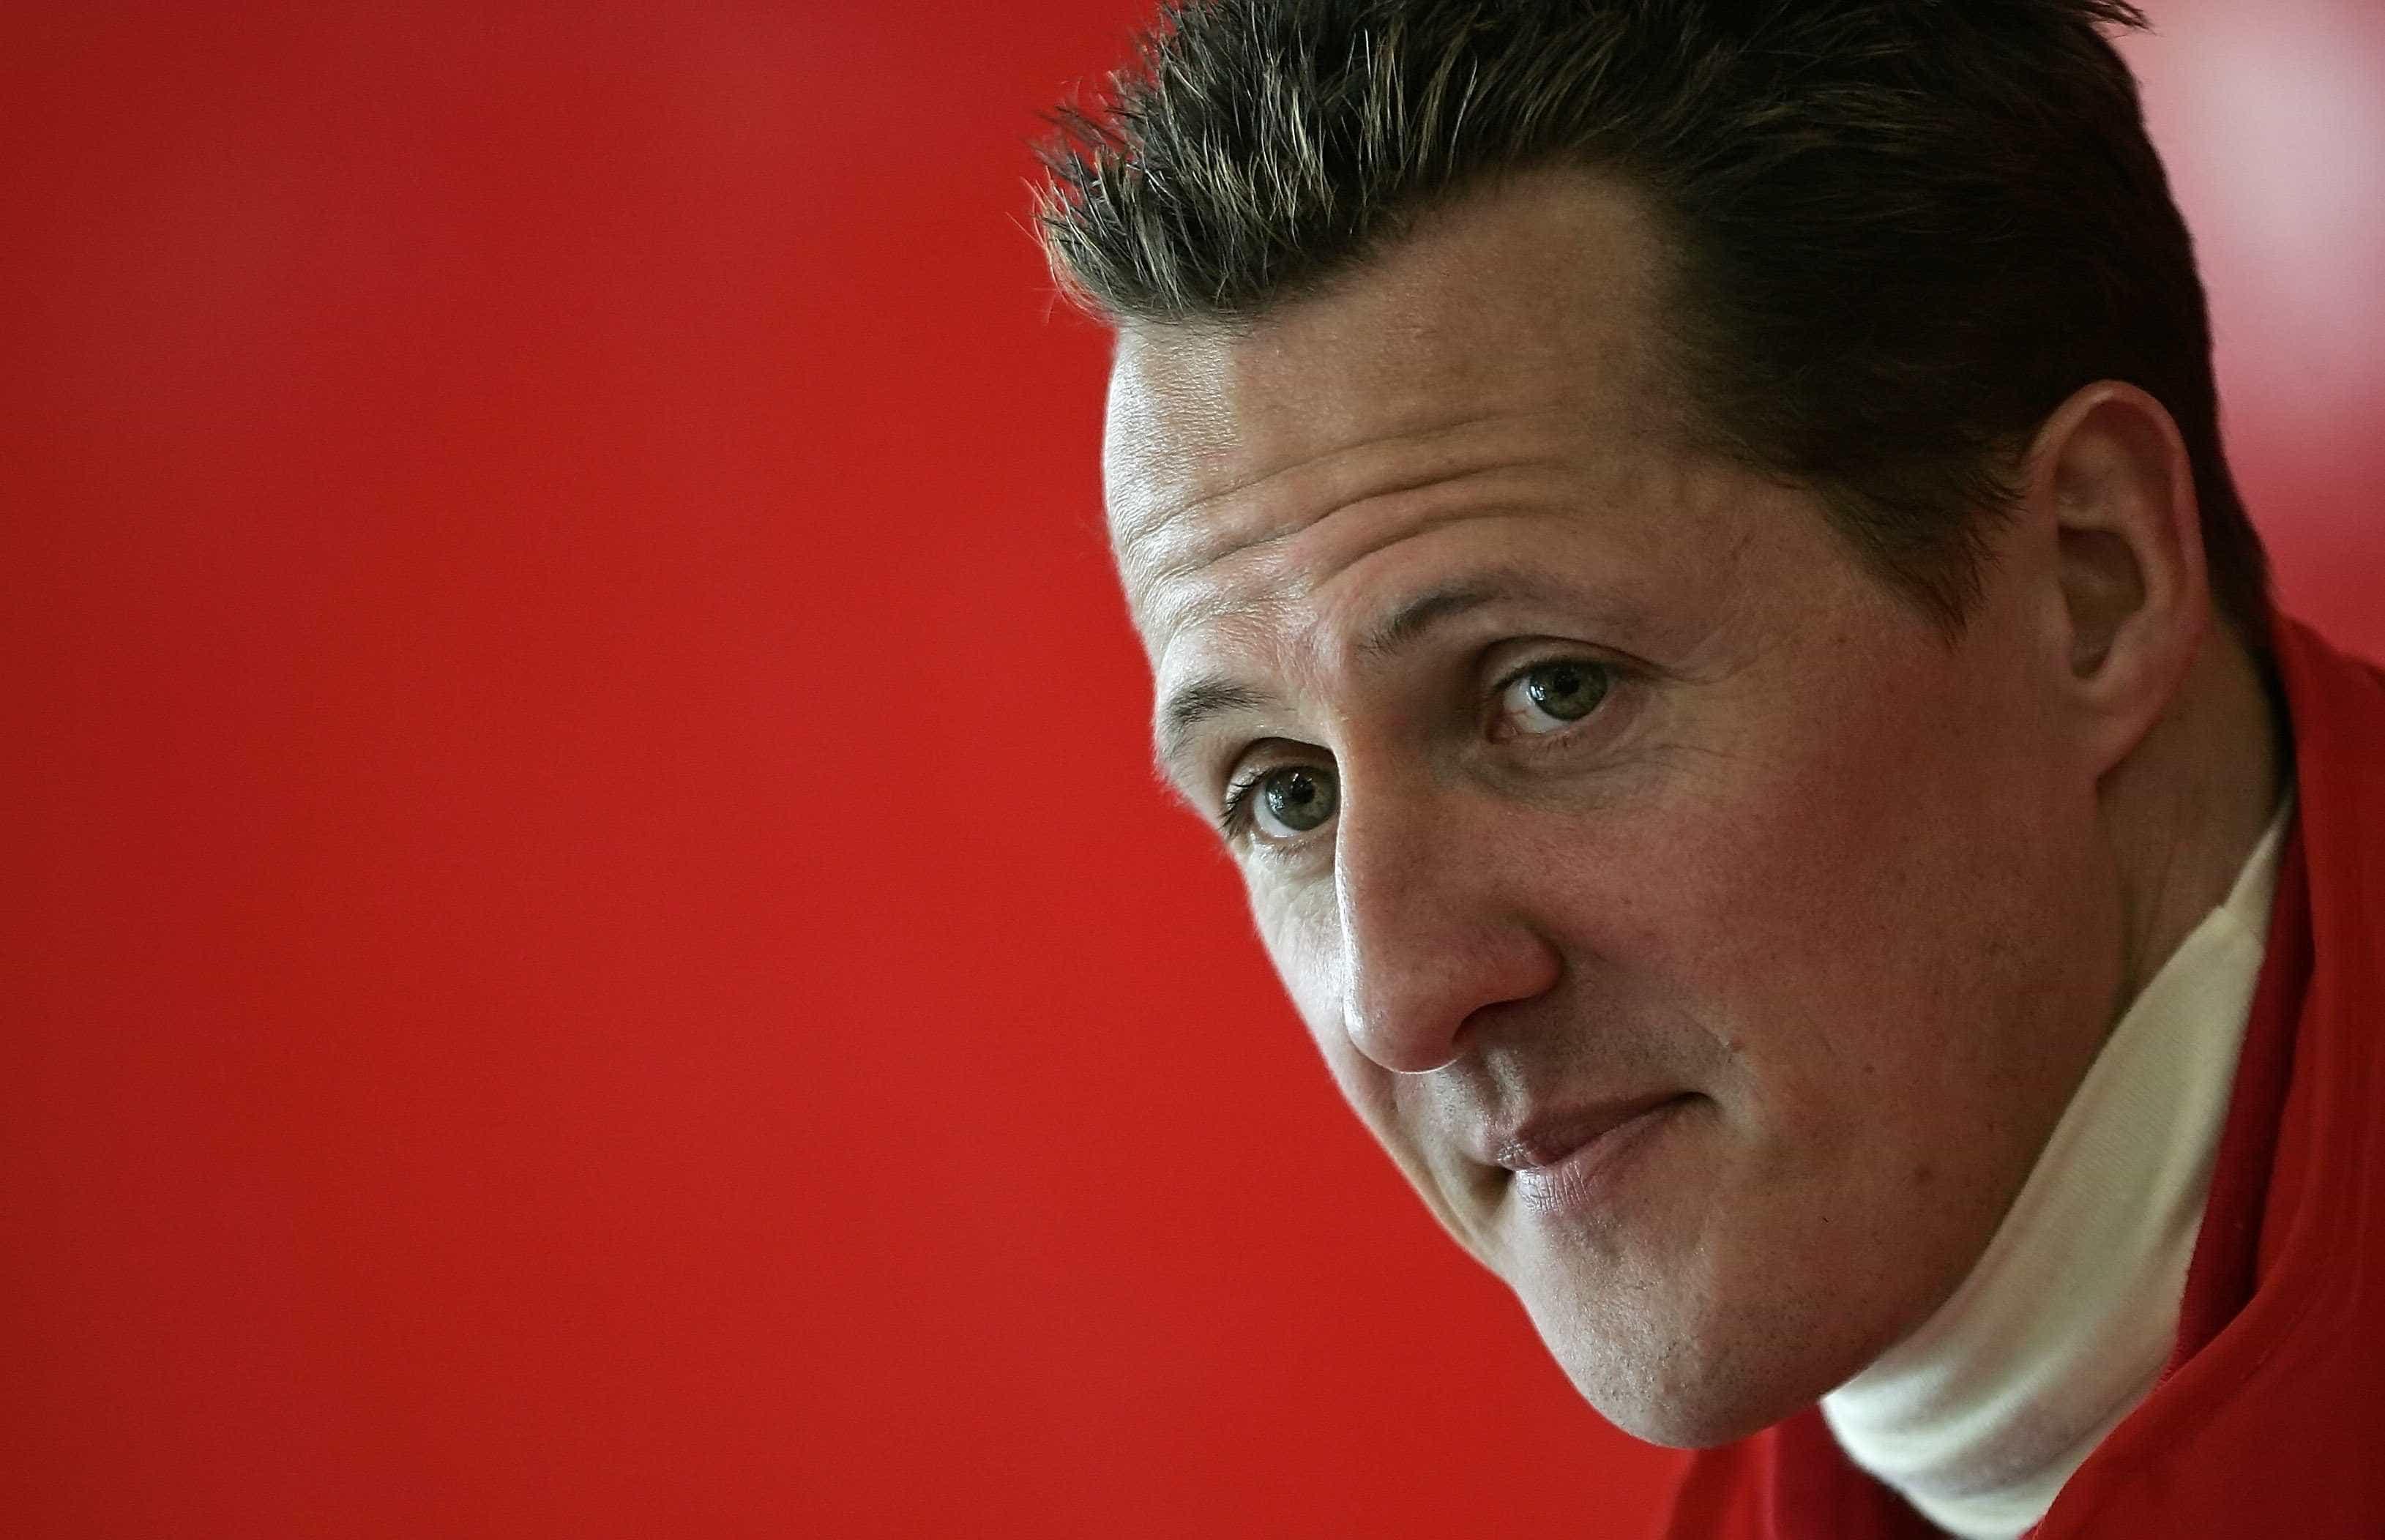 Após 5 anos, o que se sabe sobre o estado de saúde de Schumacher?